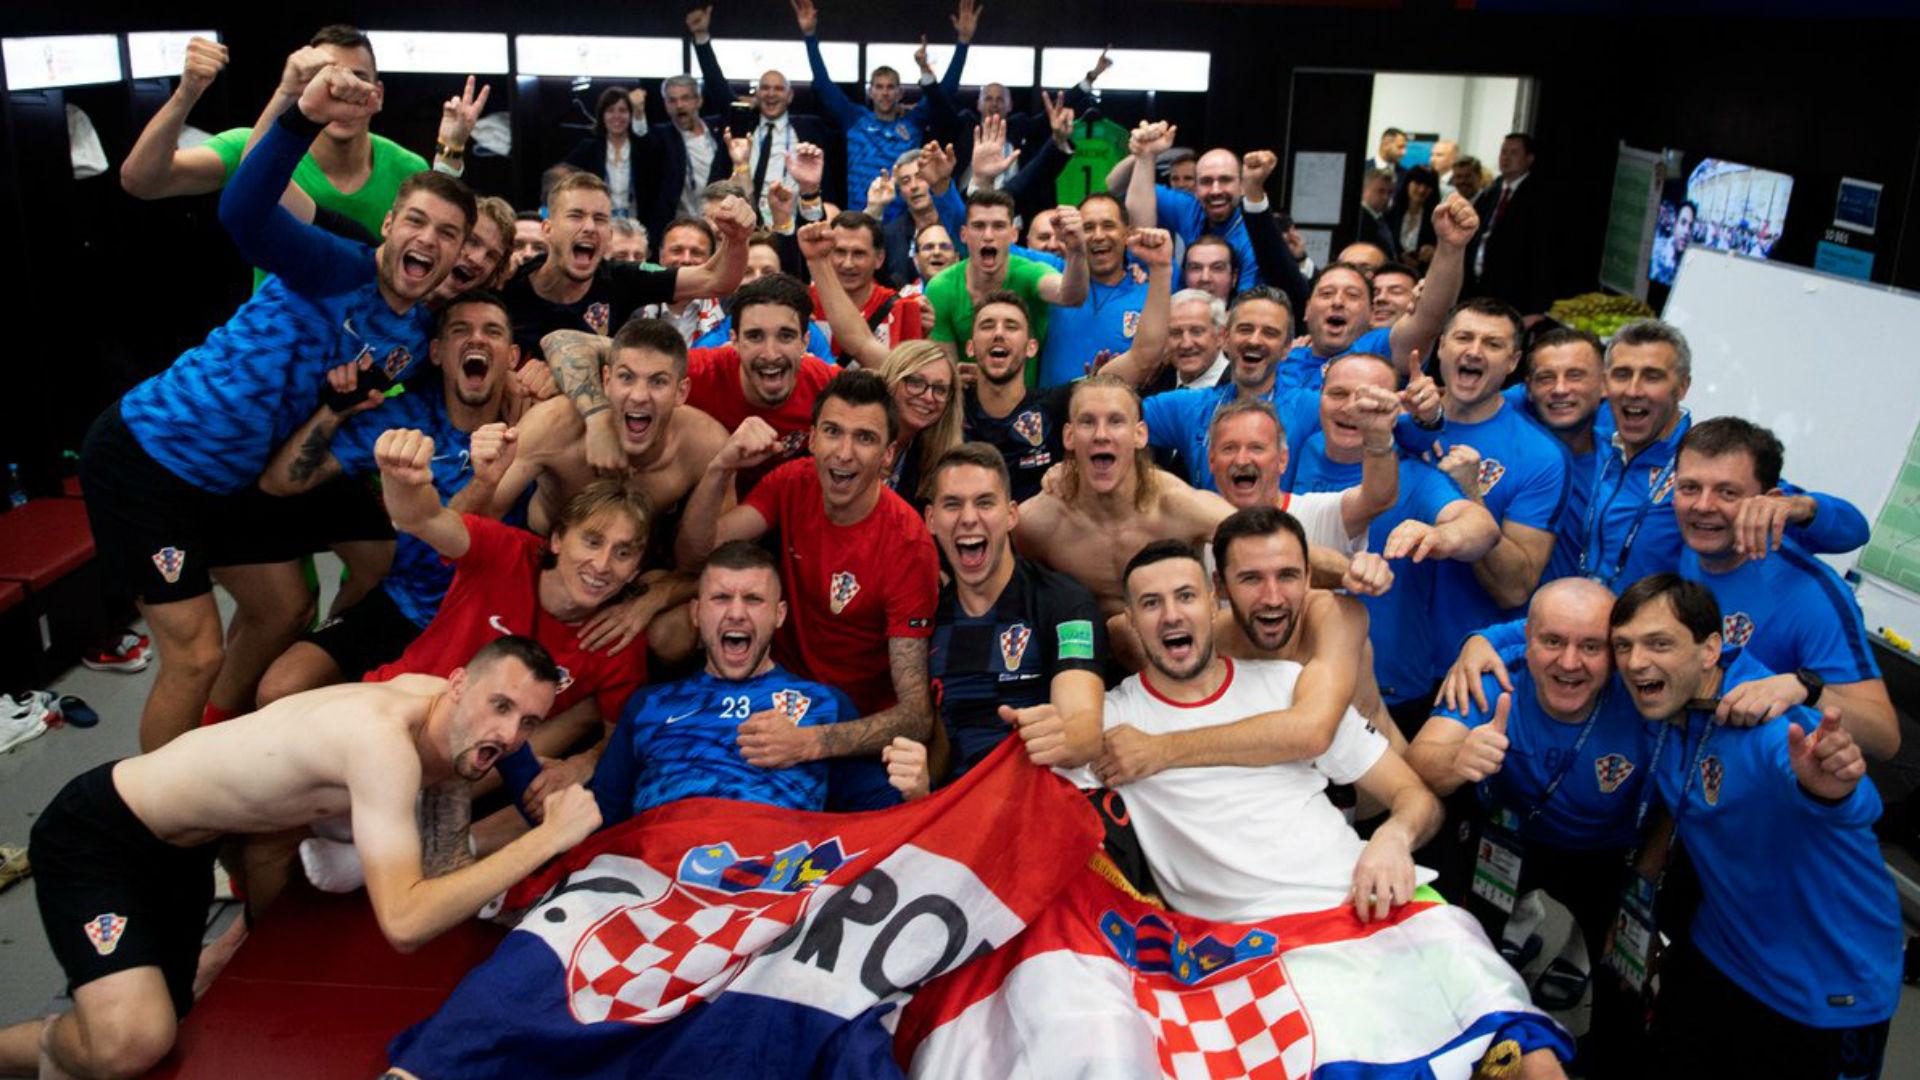 croatia celebration - world cup 2018